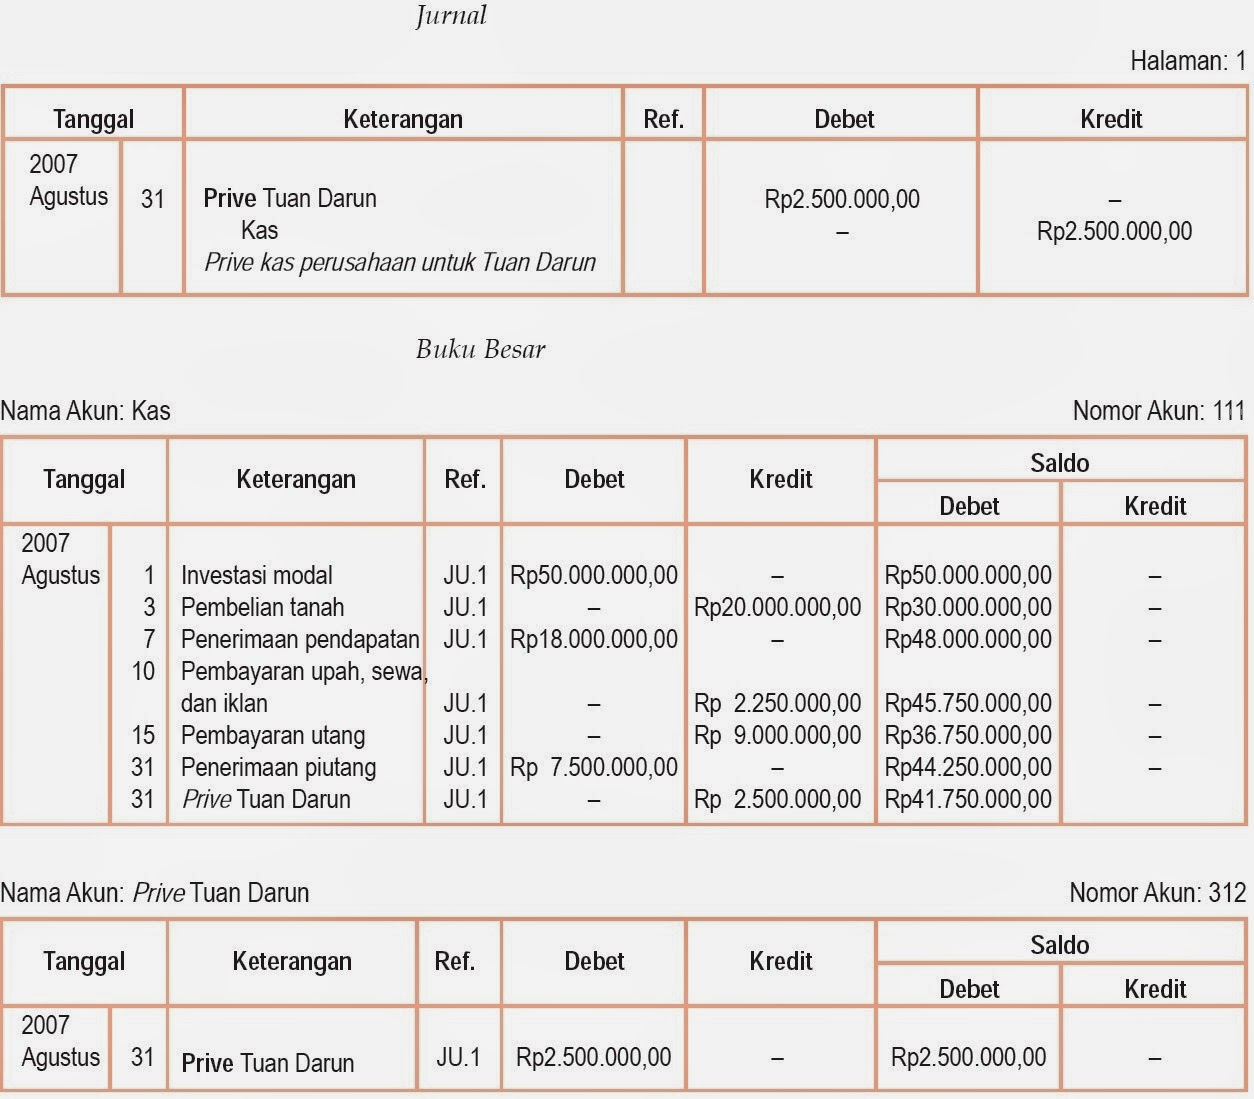 Contoh Worksheet Perusahaan Dagang Printable Worksheets And Activities For Teachers Parents Tutors And Homeschool Families